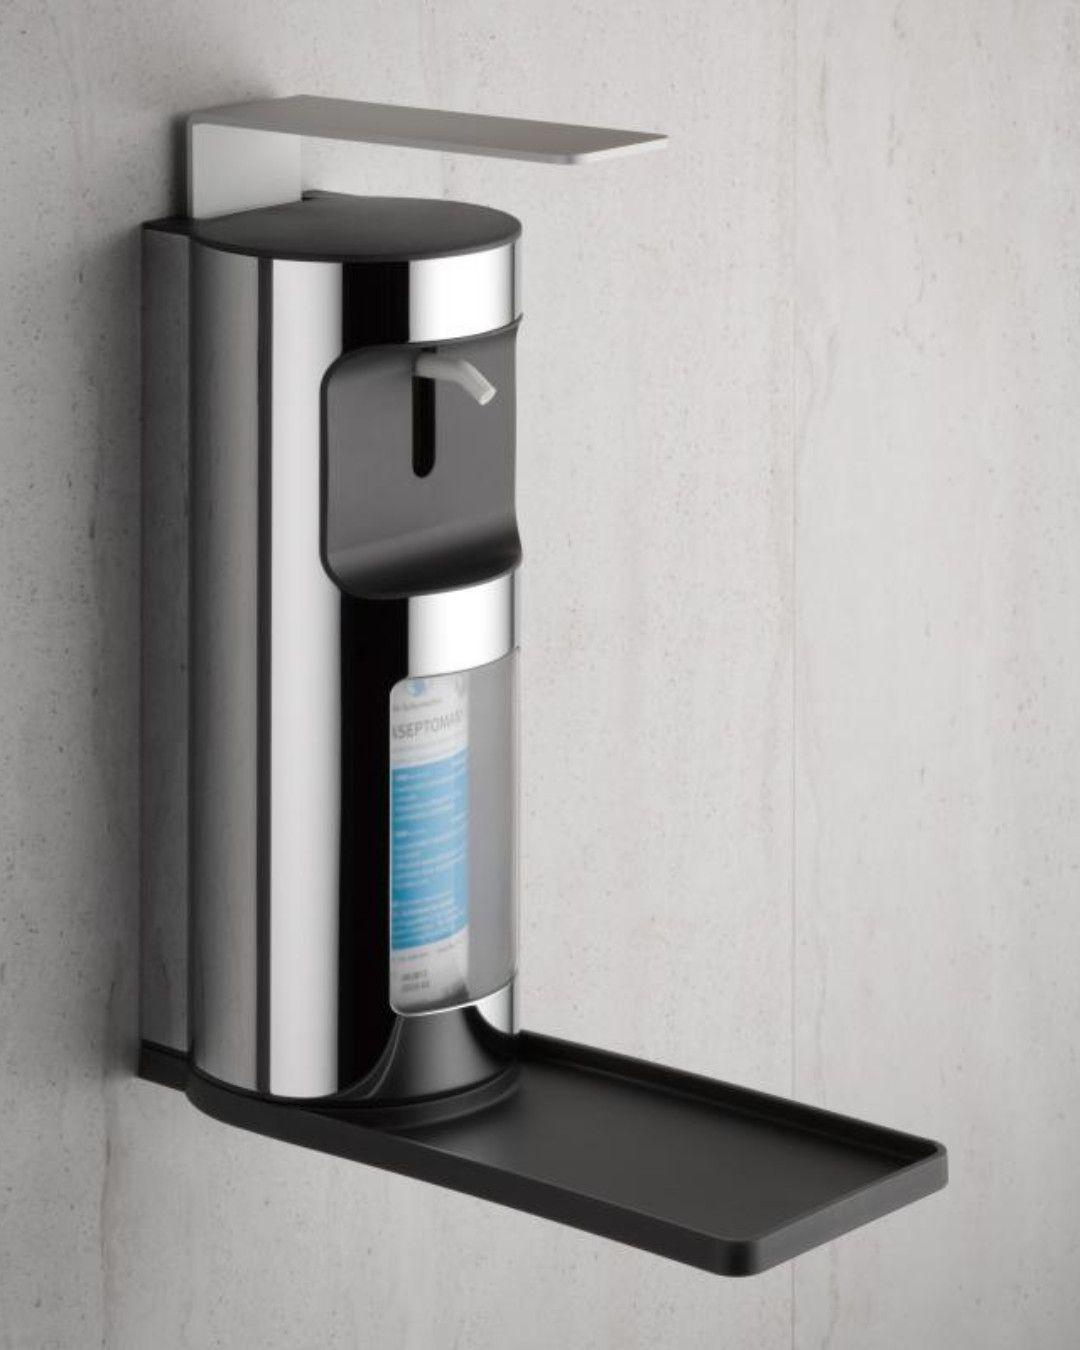 Sortiment Versandapotheke Hausapotheke Desinfektionsmittel